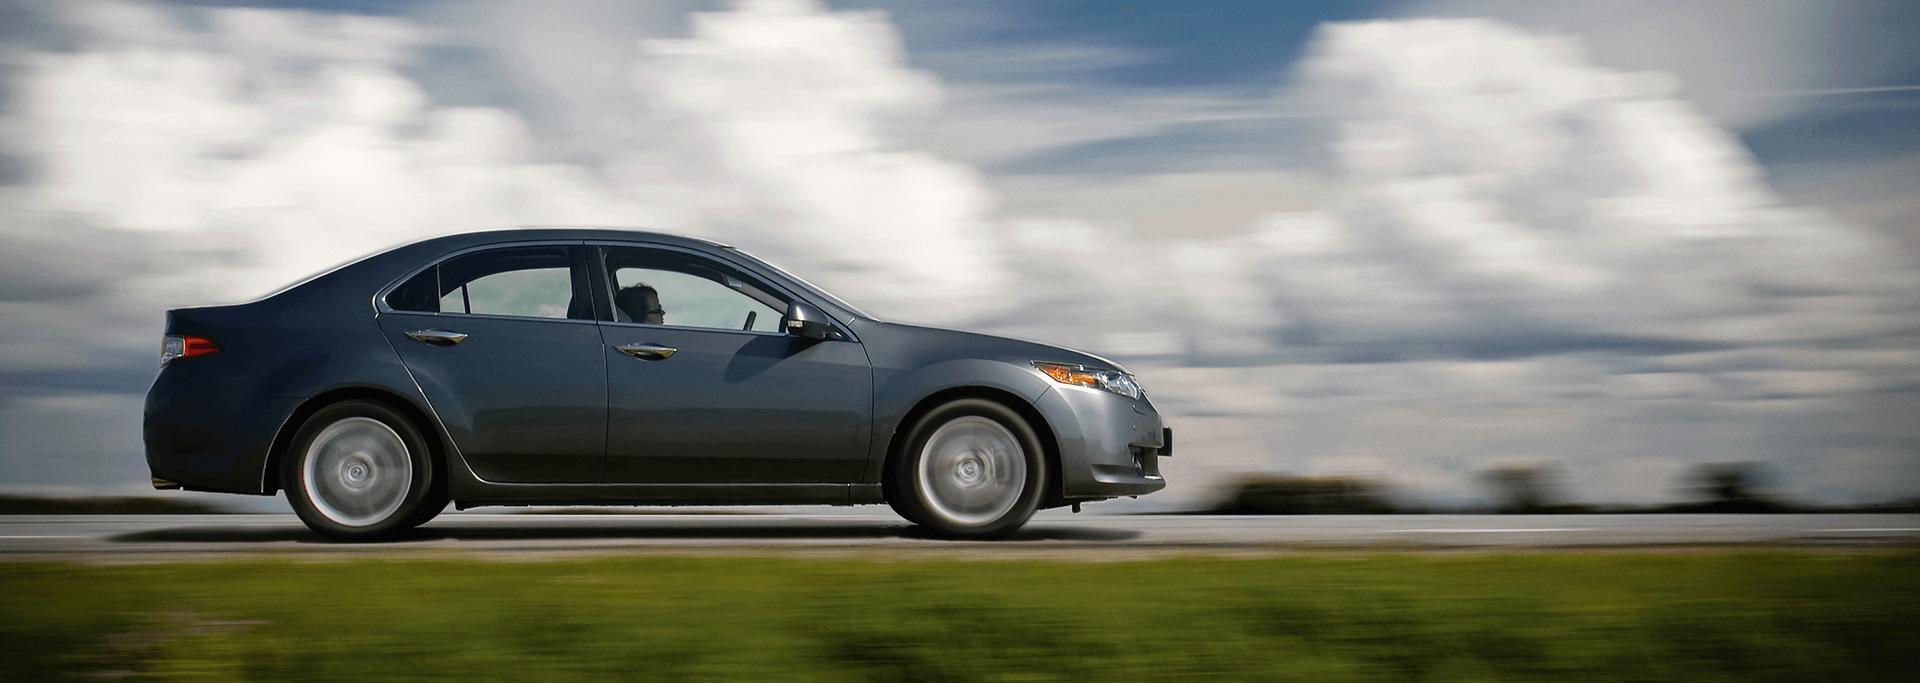 Quality Used Vehicles | Northville Motors | Northville, MI